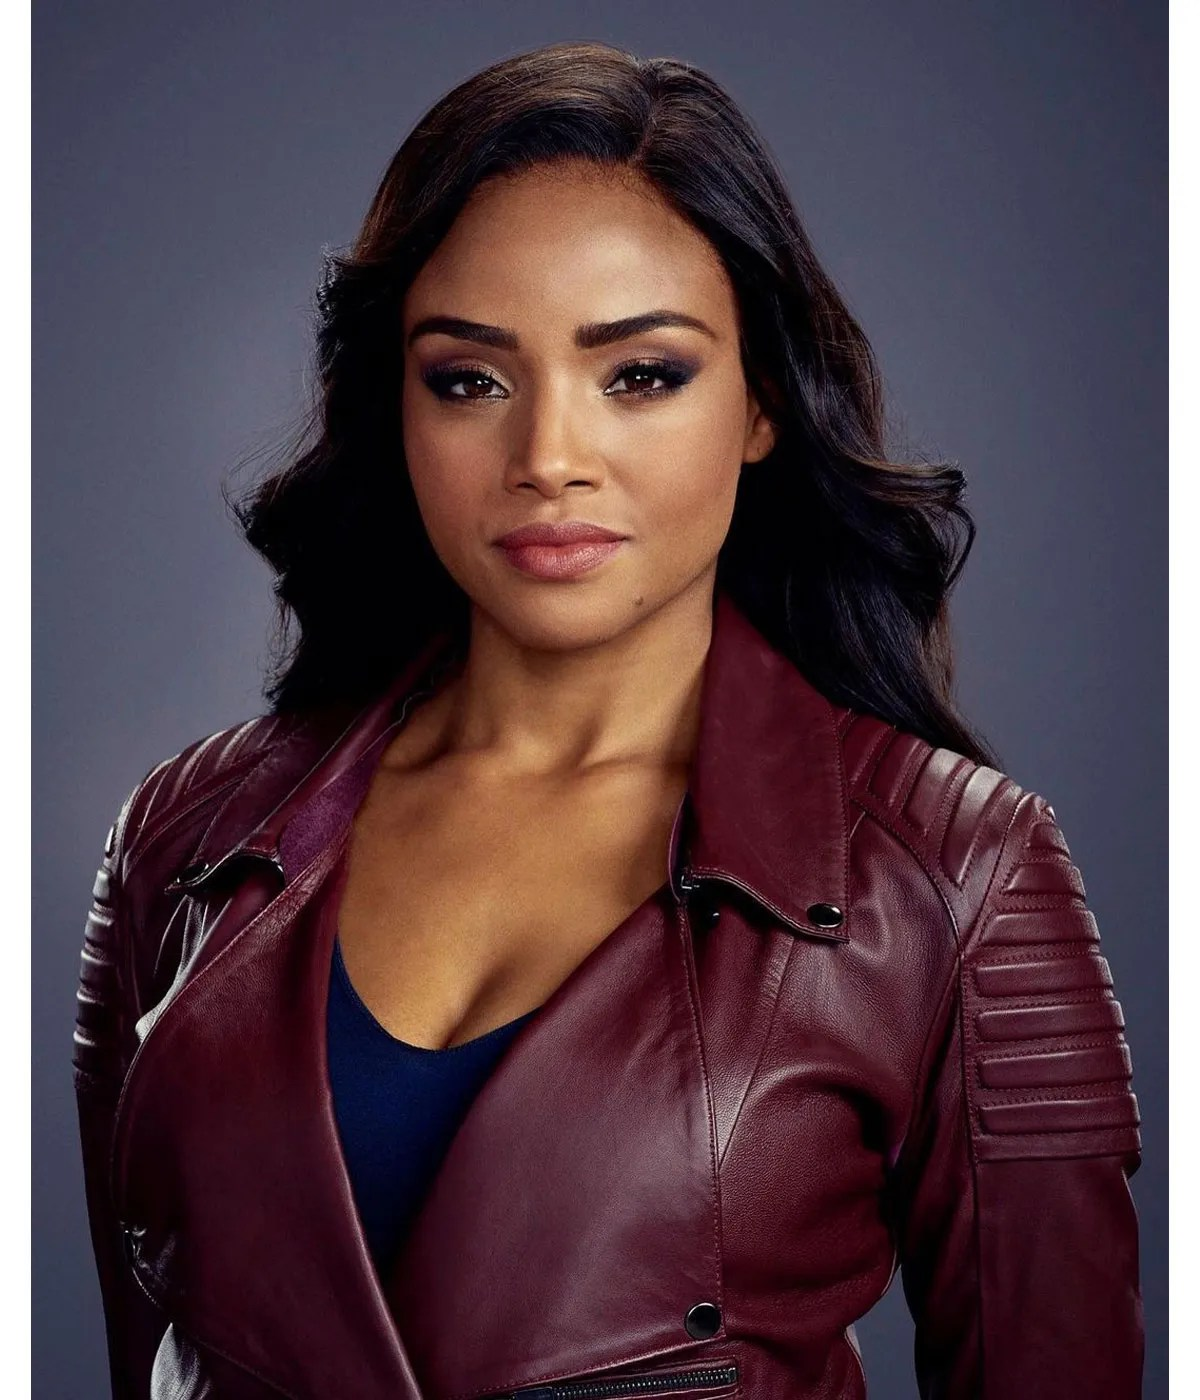 batwoman-season-02-meagan-tandy-leather-jacket